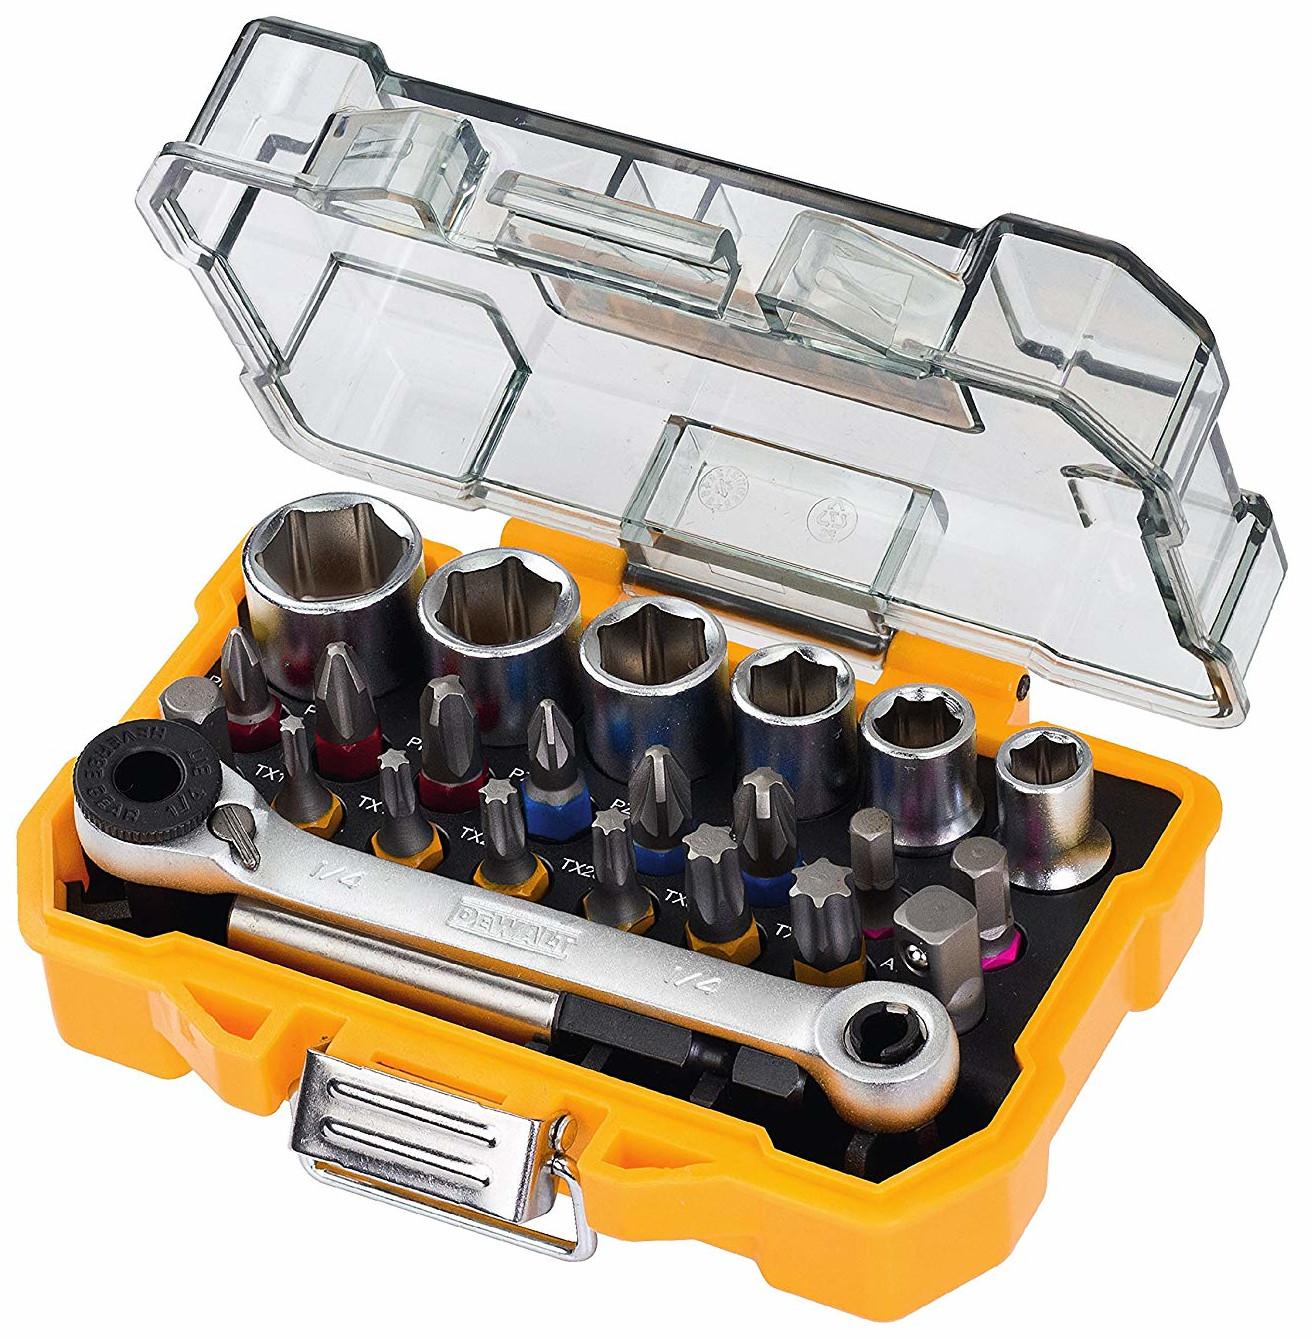 Dewalt 24 Piece High Performance Socket and Screwdriving Set with Case (DT71516) for £11.98 (Prime) / £16.47 (NP) delivered @ Amazon